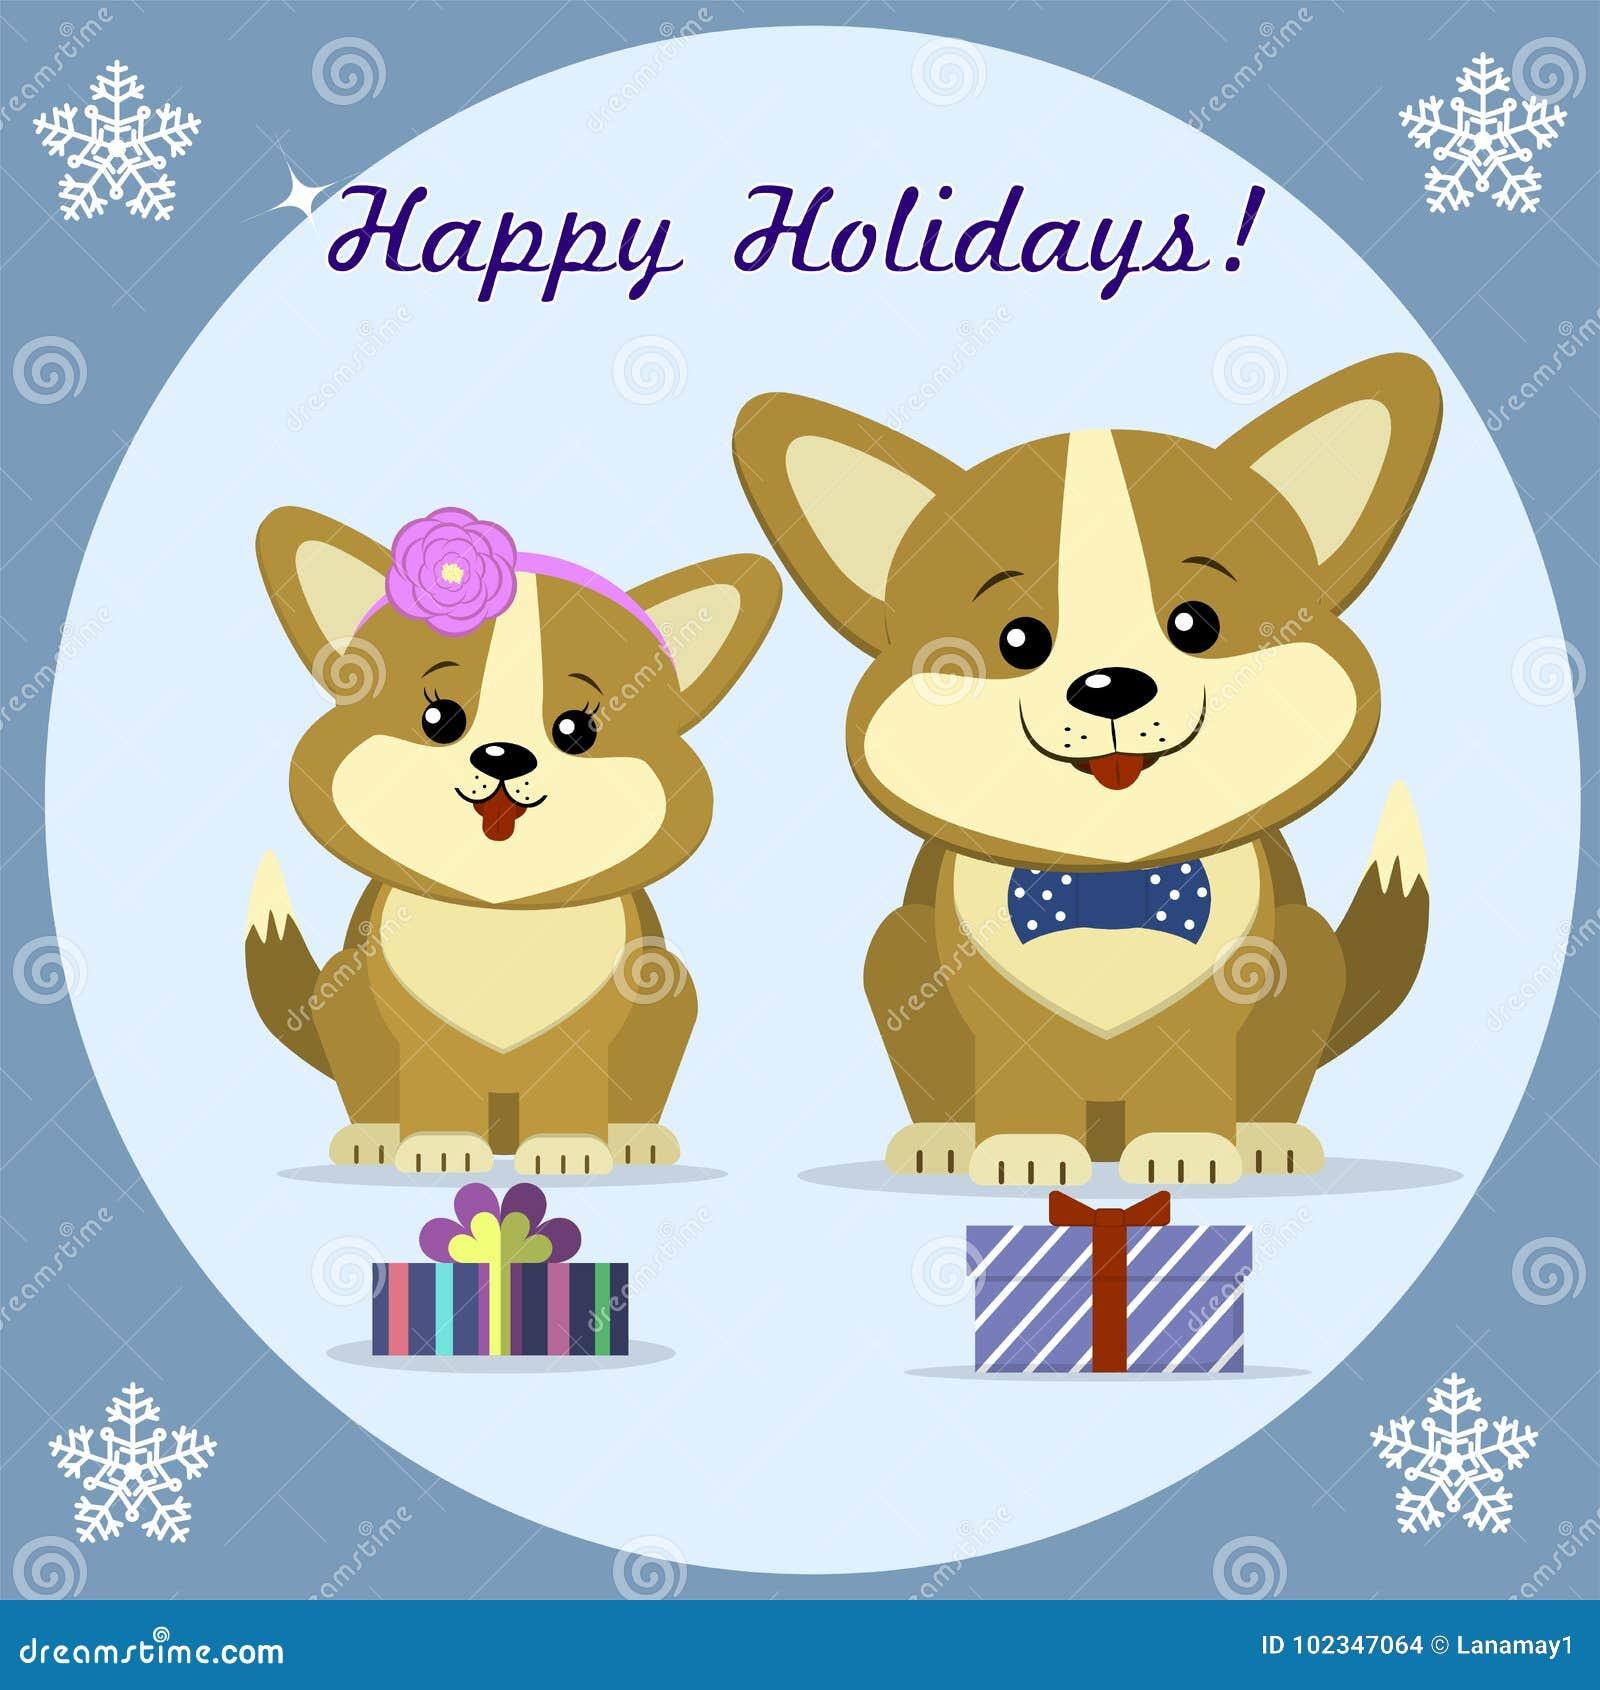 Christmas Card With Two Cute Dog Corgi Stock Vector - Illustration ...